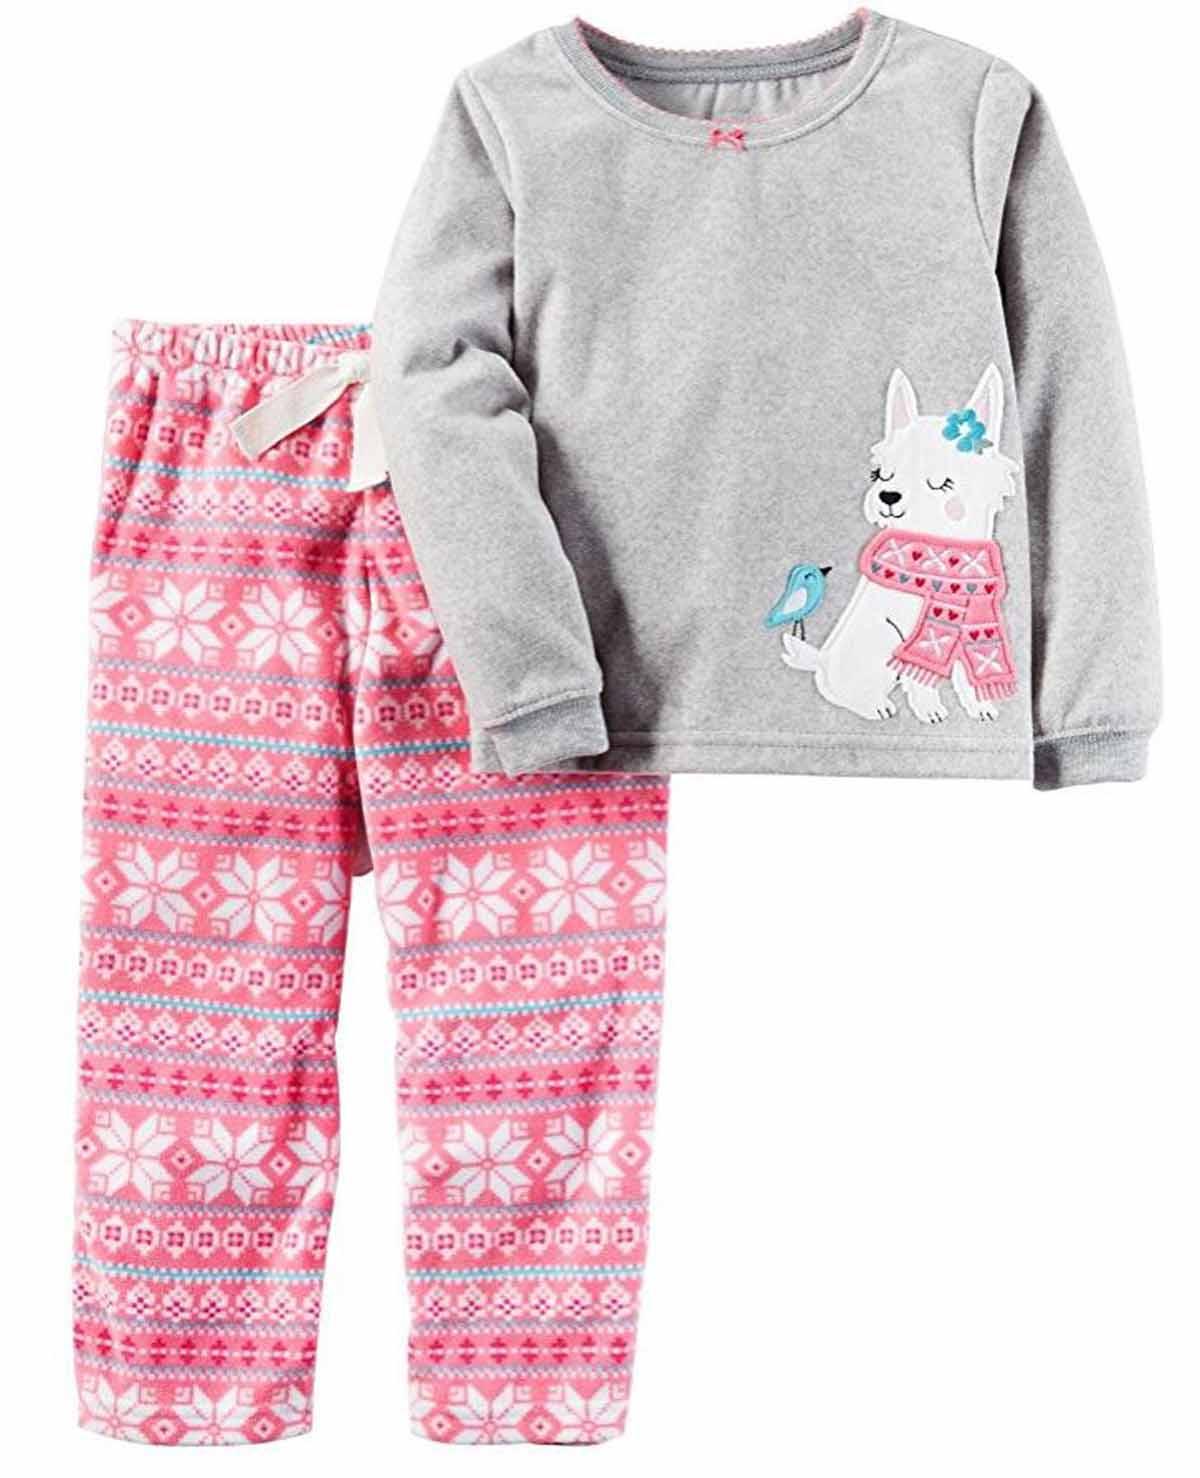 b9bacc97cbd8 Carters Girls 2 Piece Pajamas Shirt and Pant Sleepwear